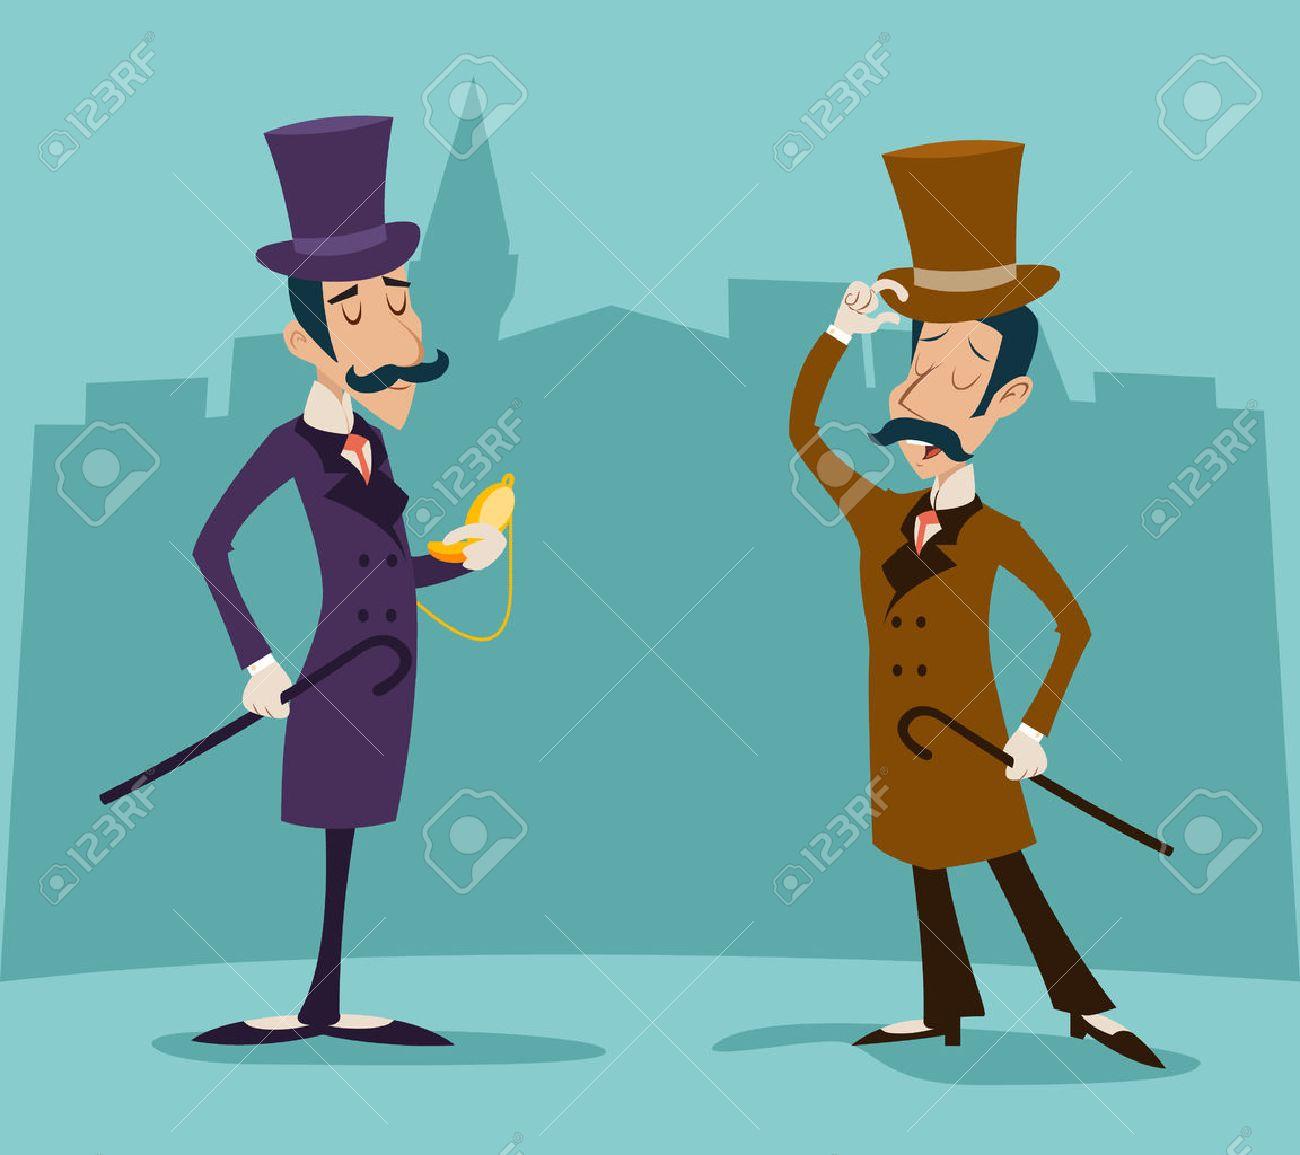 Victorian Gentleman Meeting Businessman Cartoon Character Icon Stylish English City Background Retro Vintage Great Britain Design Vector Illustration - 51246064